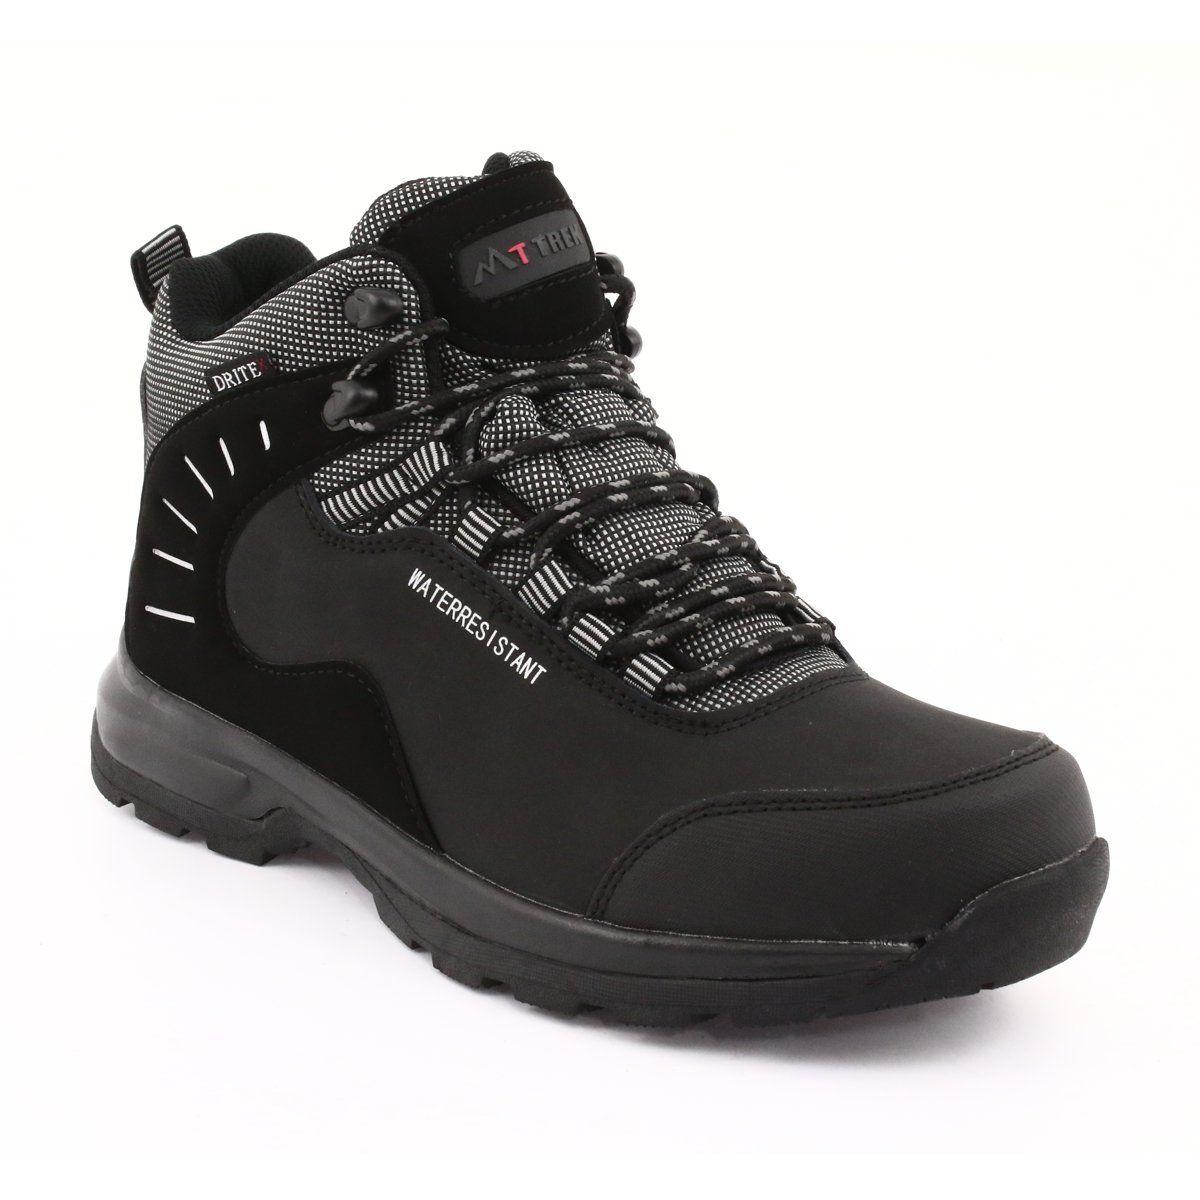 Trekkingowe Wiazane Czarne Mttrek 011 Trekking Shoes Hiking Boots Natural Leather